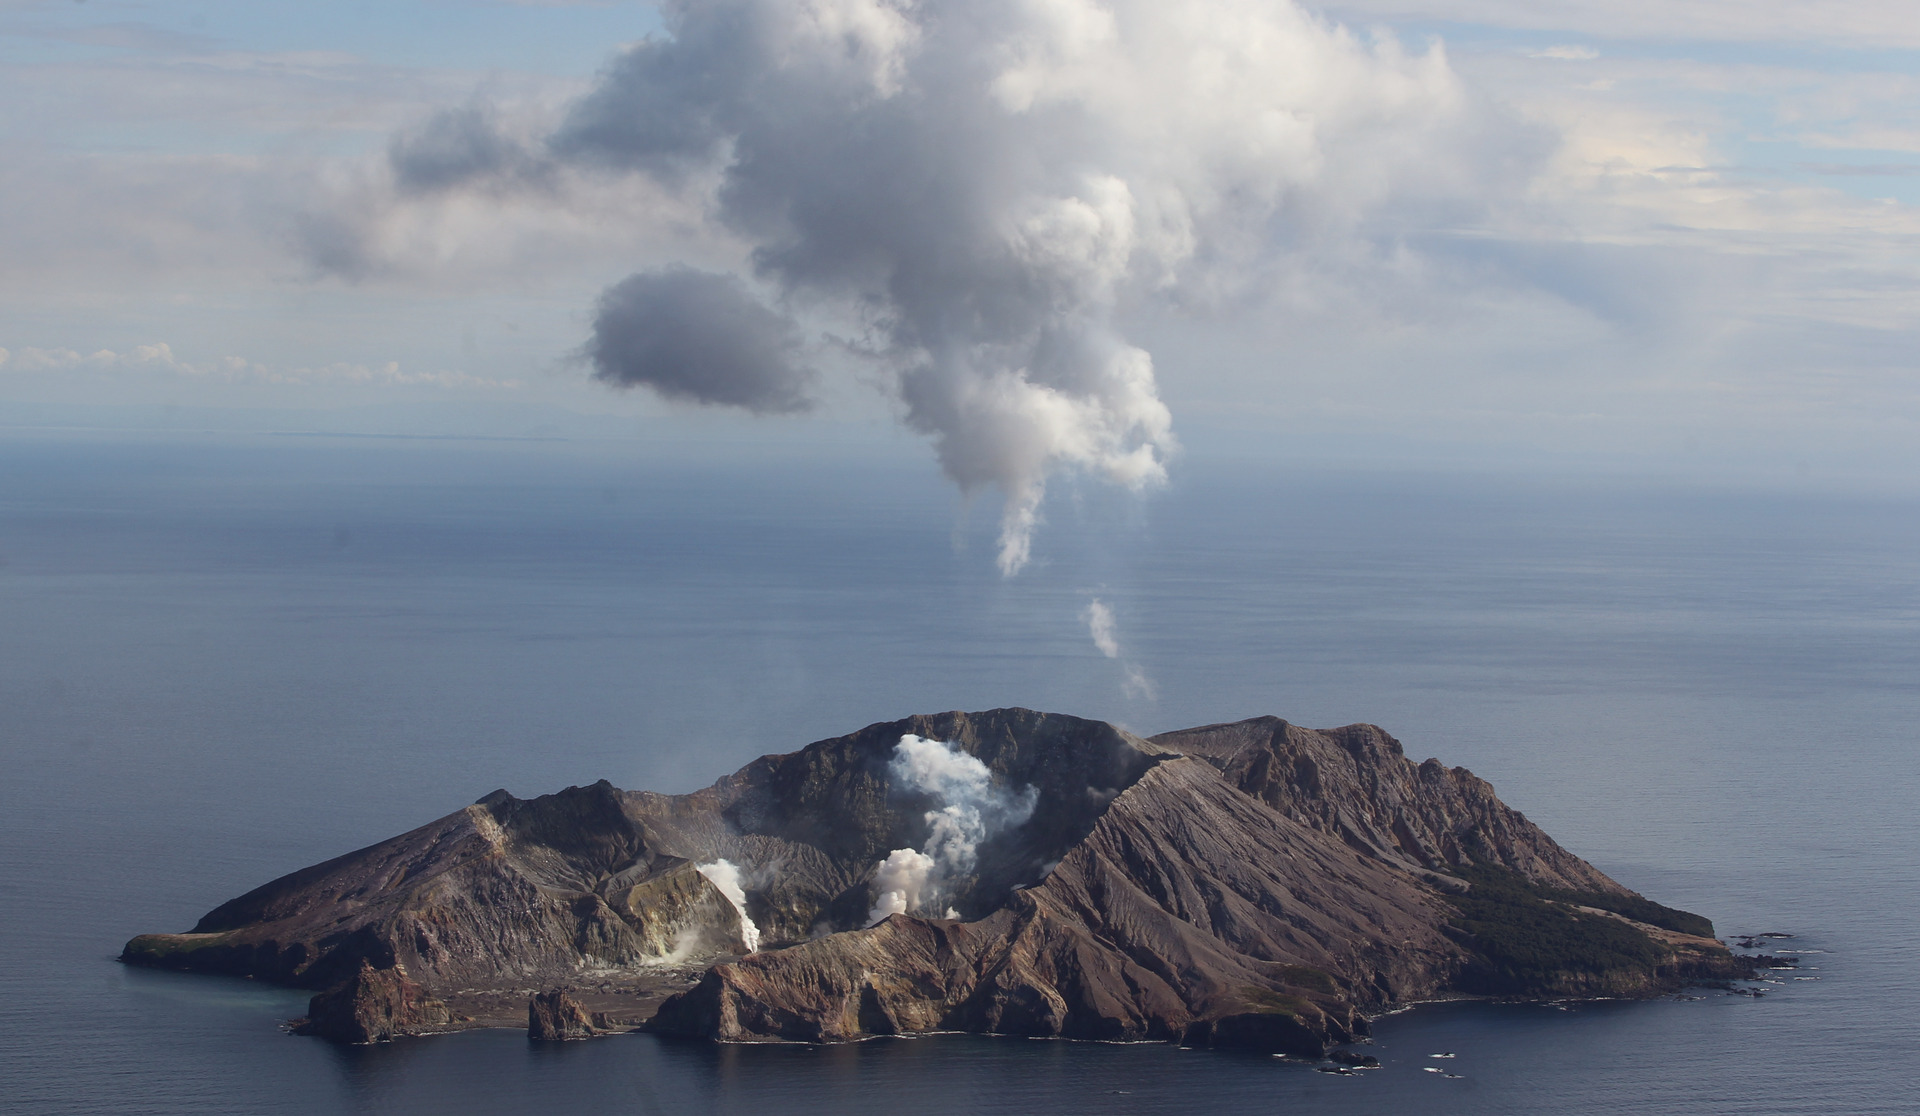 Volcanic alert raised: Activity increases on White Island